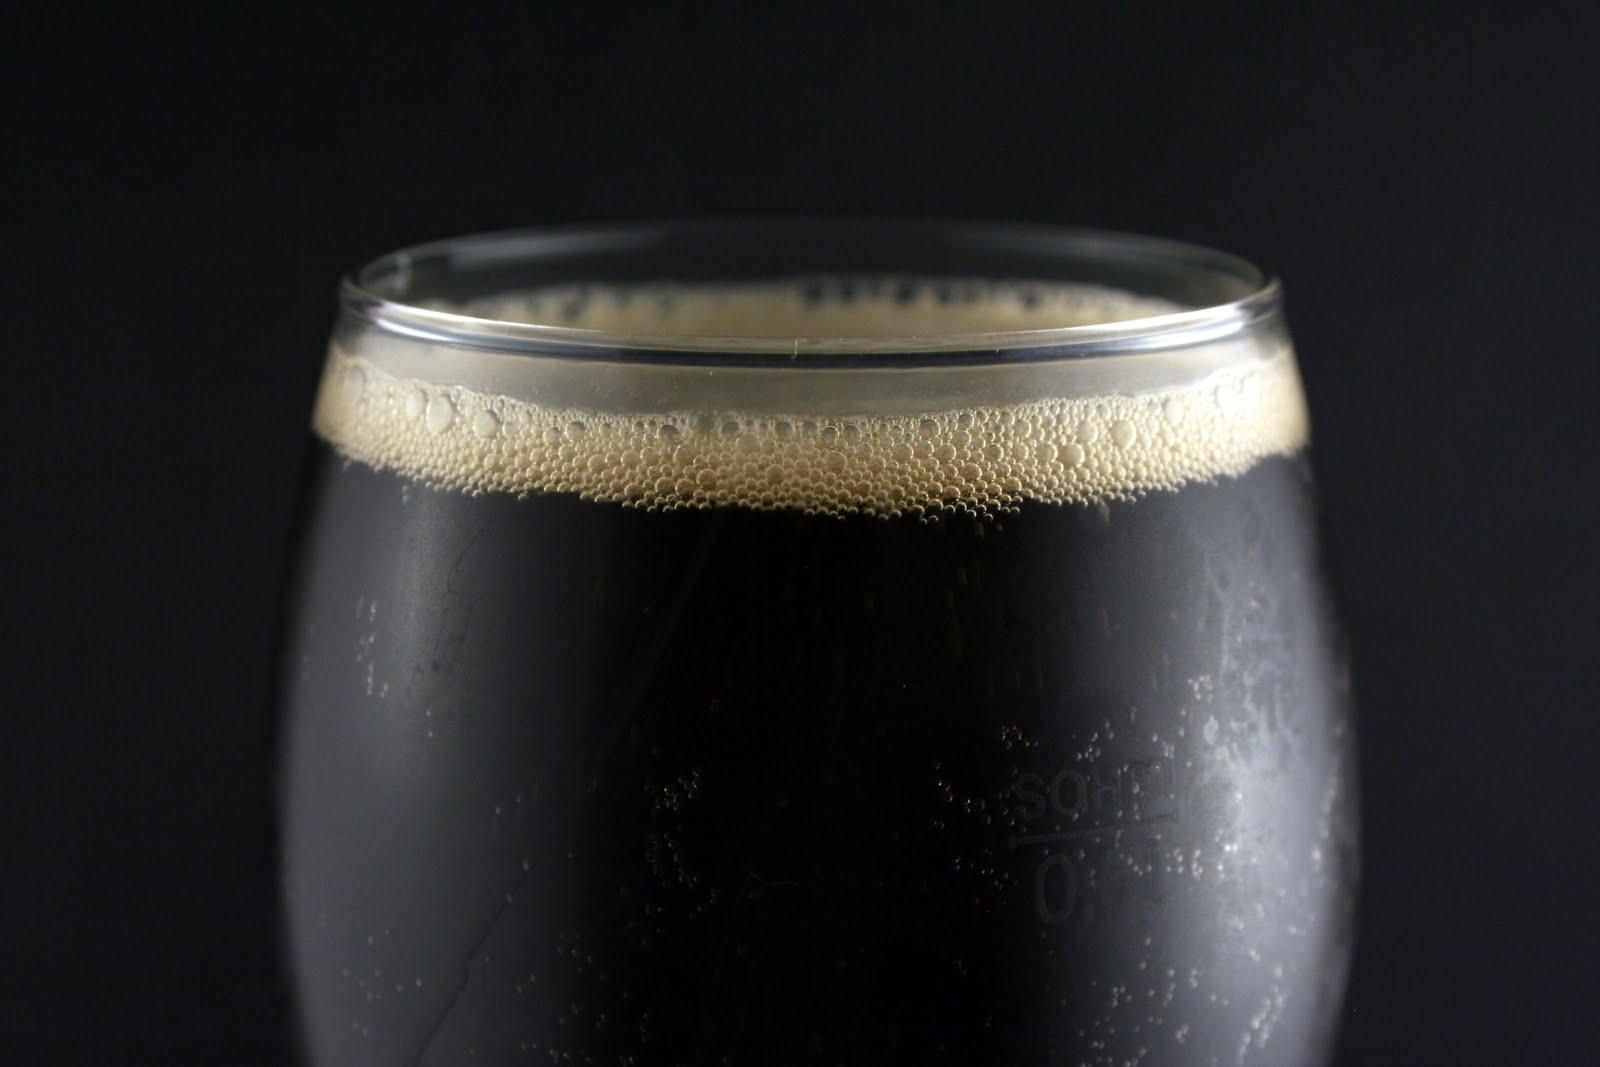 temnoe-pivo--prichina-razdora